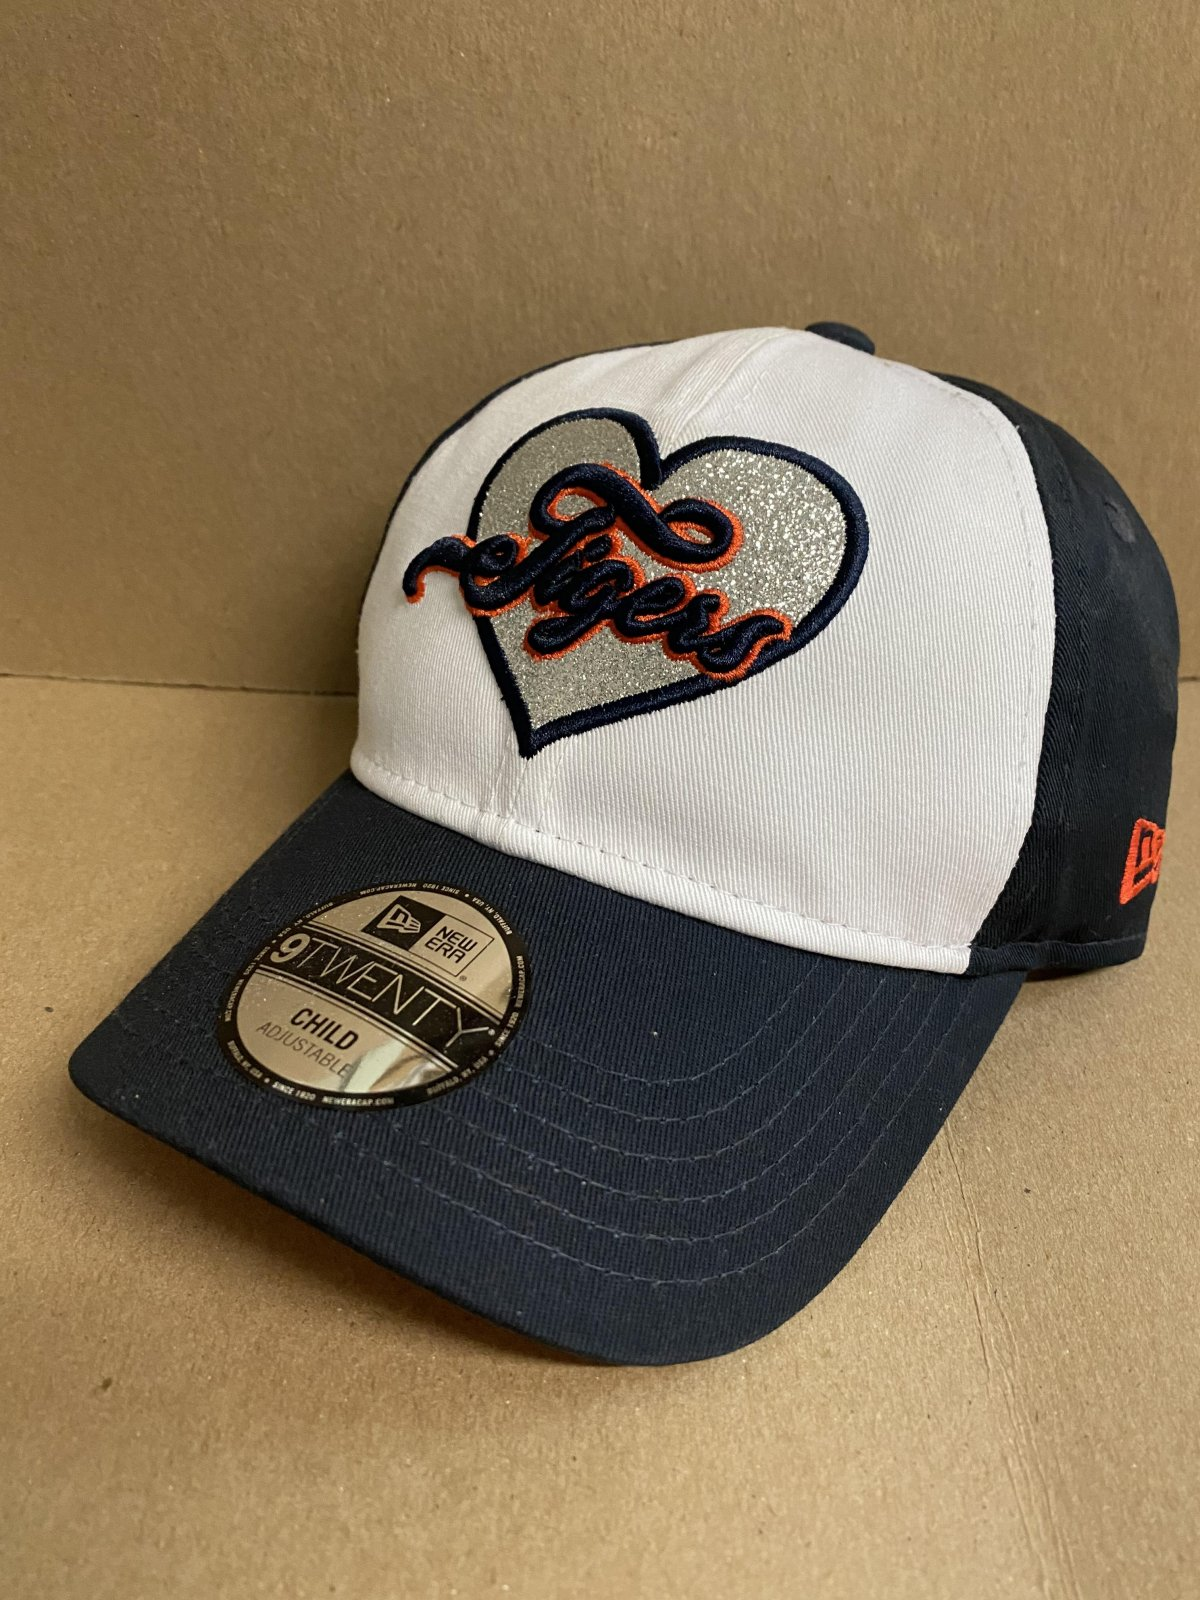 Detroit Tigers Sparkly Fan Child Hat